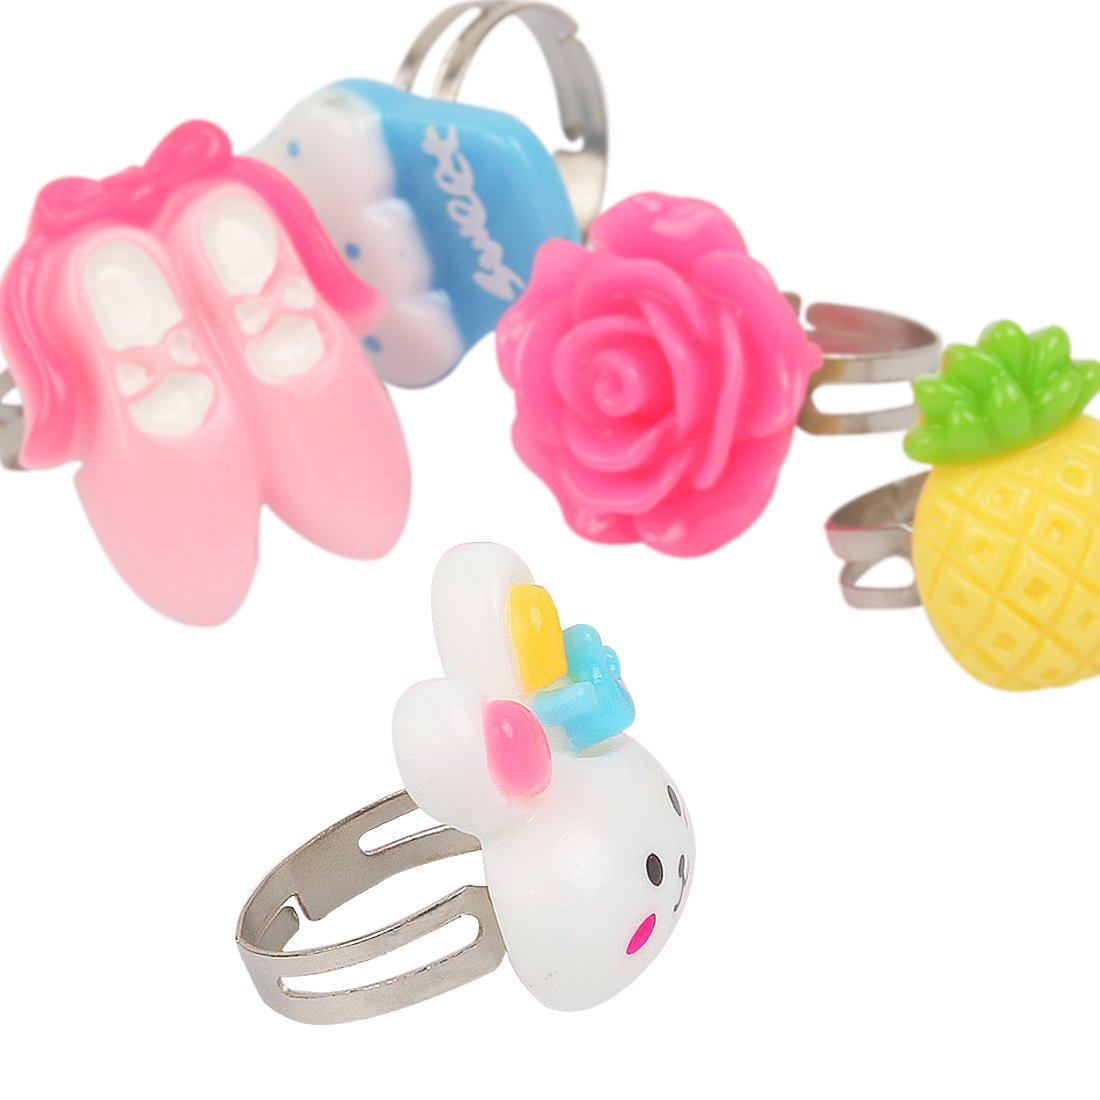 kilofly 6 Sets Princess Party Favors Girls Jewelry Rings Elastic Bracelets Pack by kilofly (Image #3)